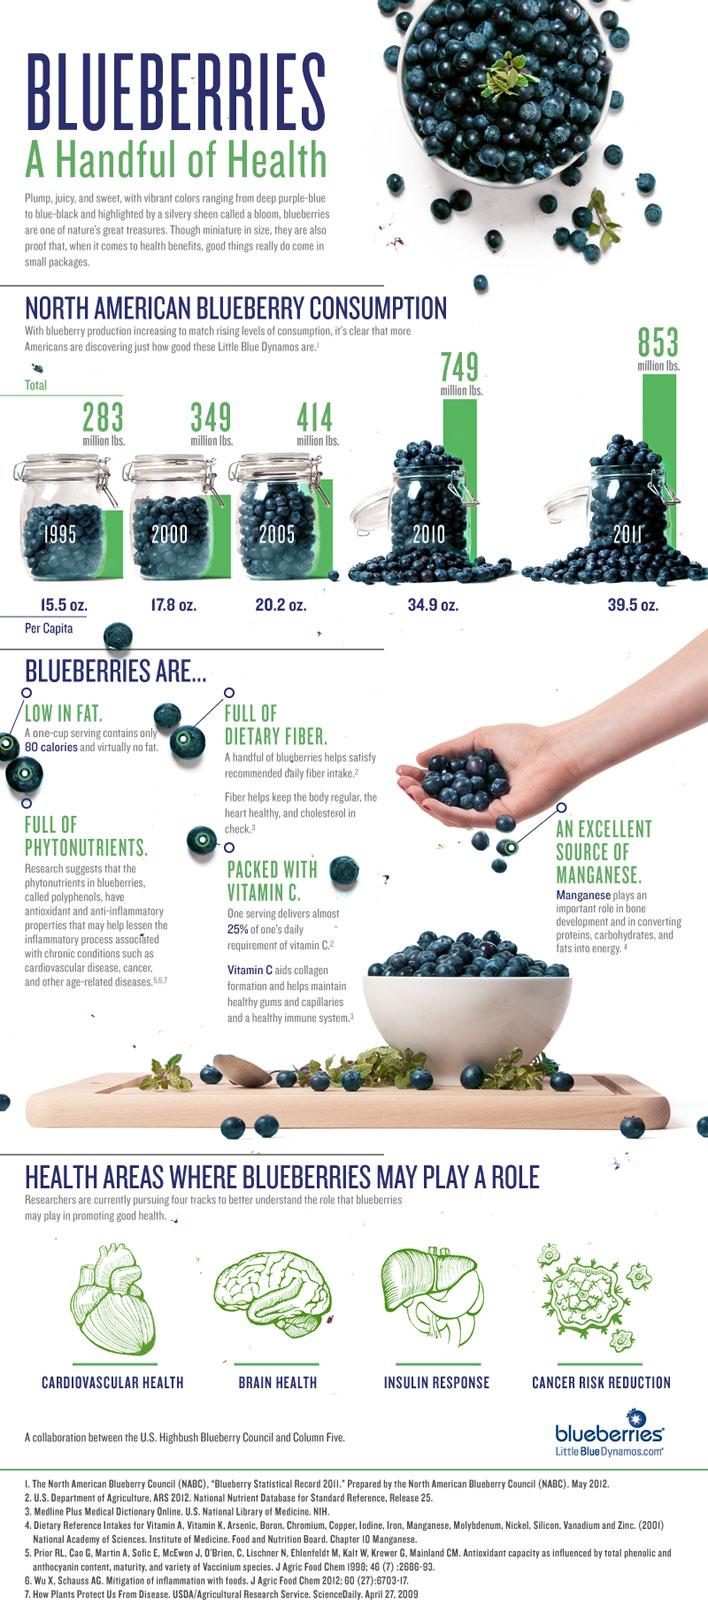 9 Blueberry Benefits Infographic